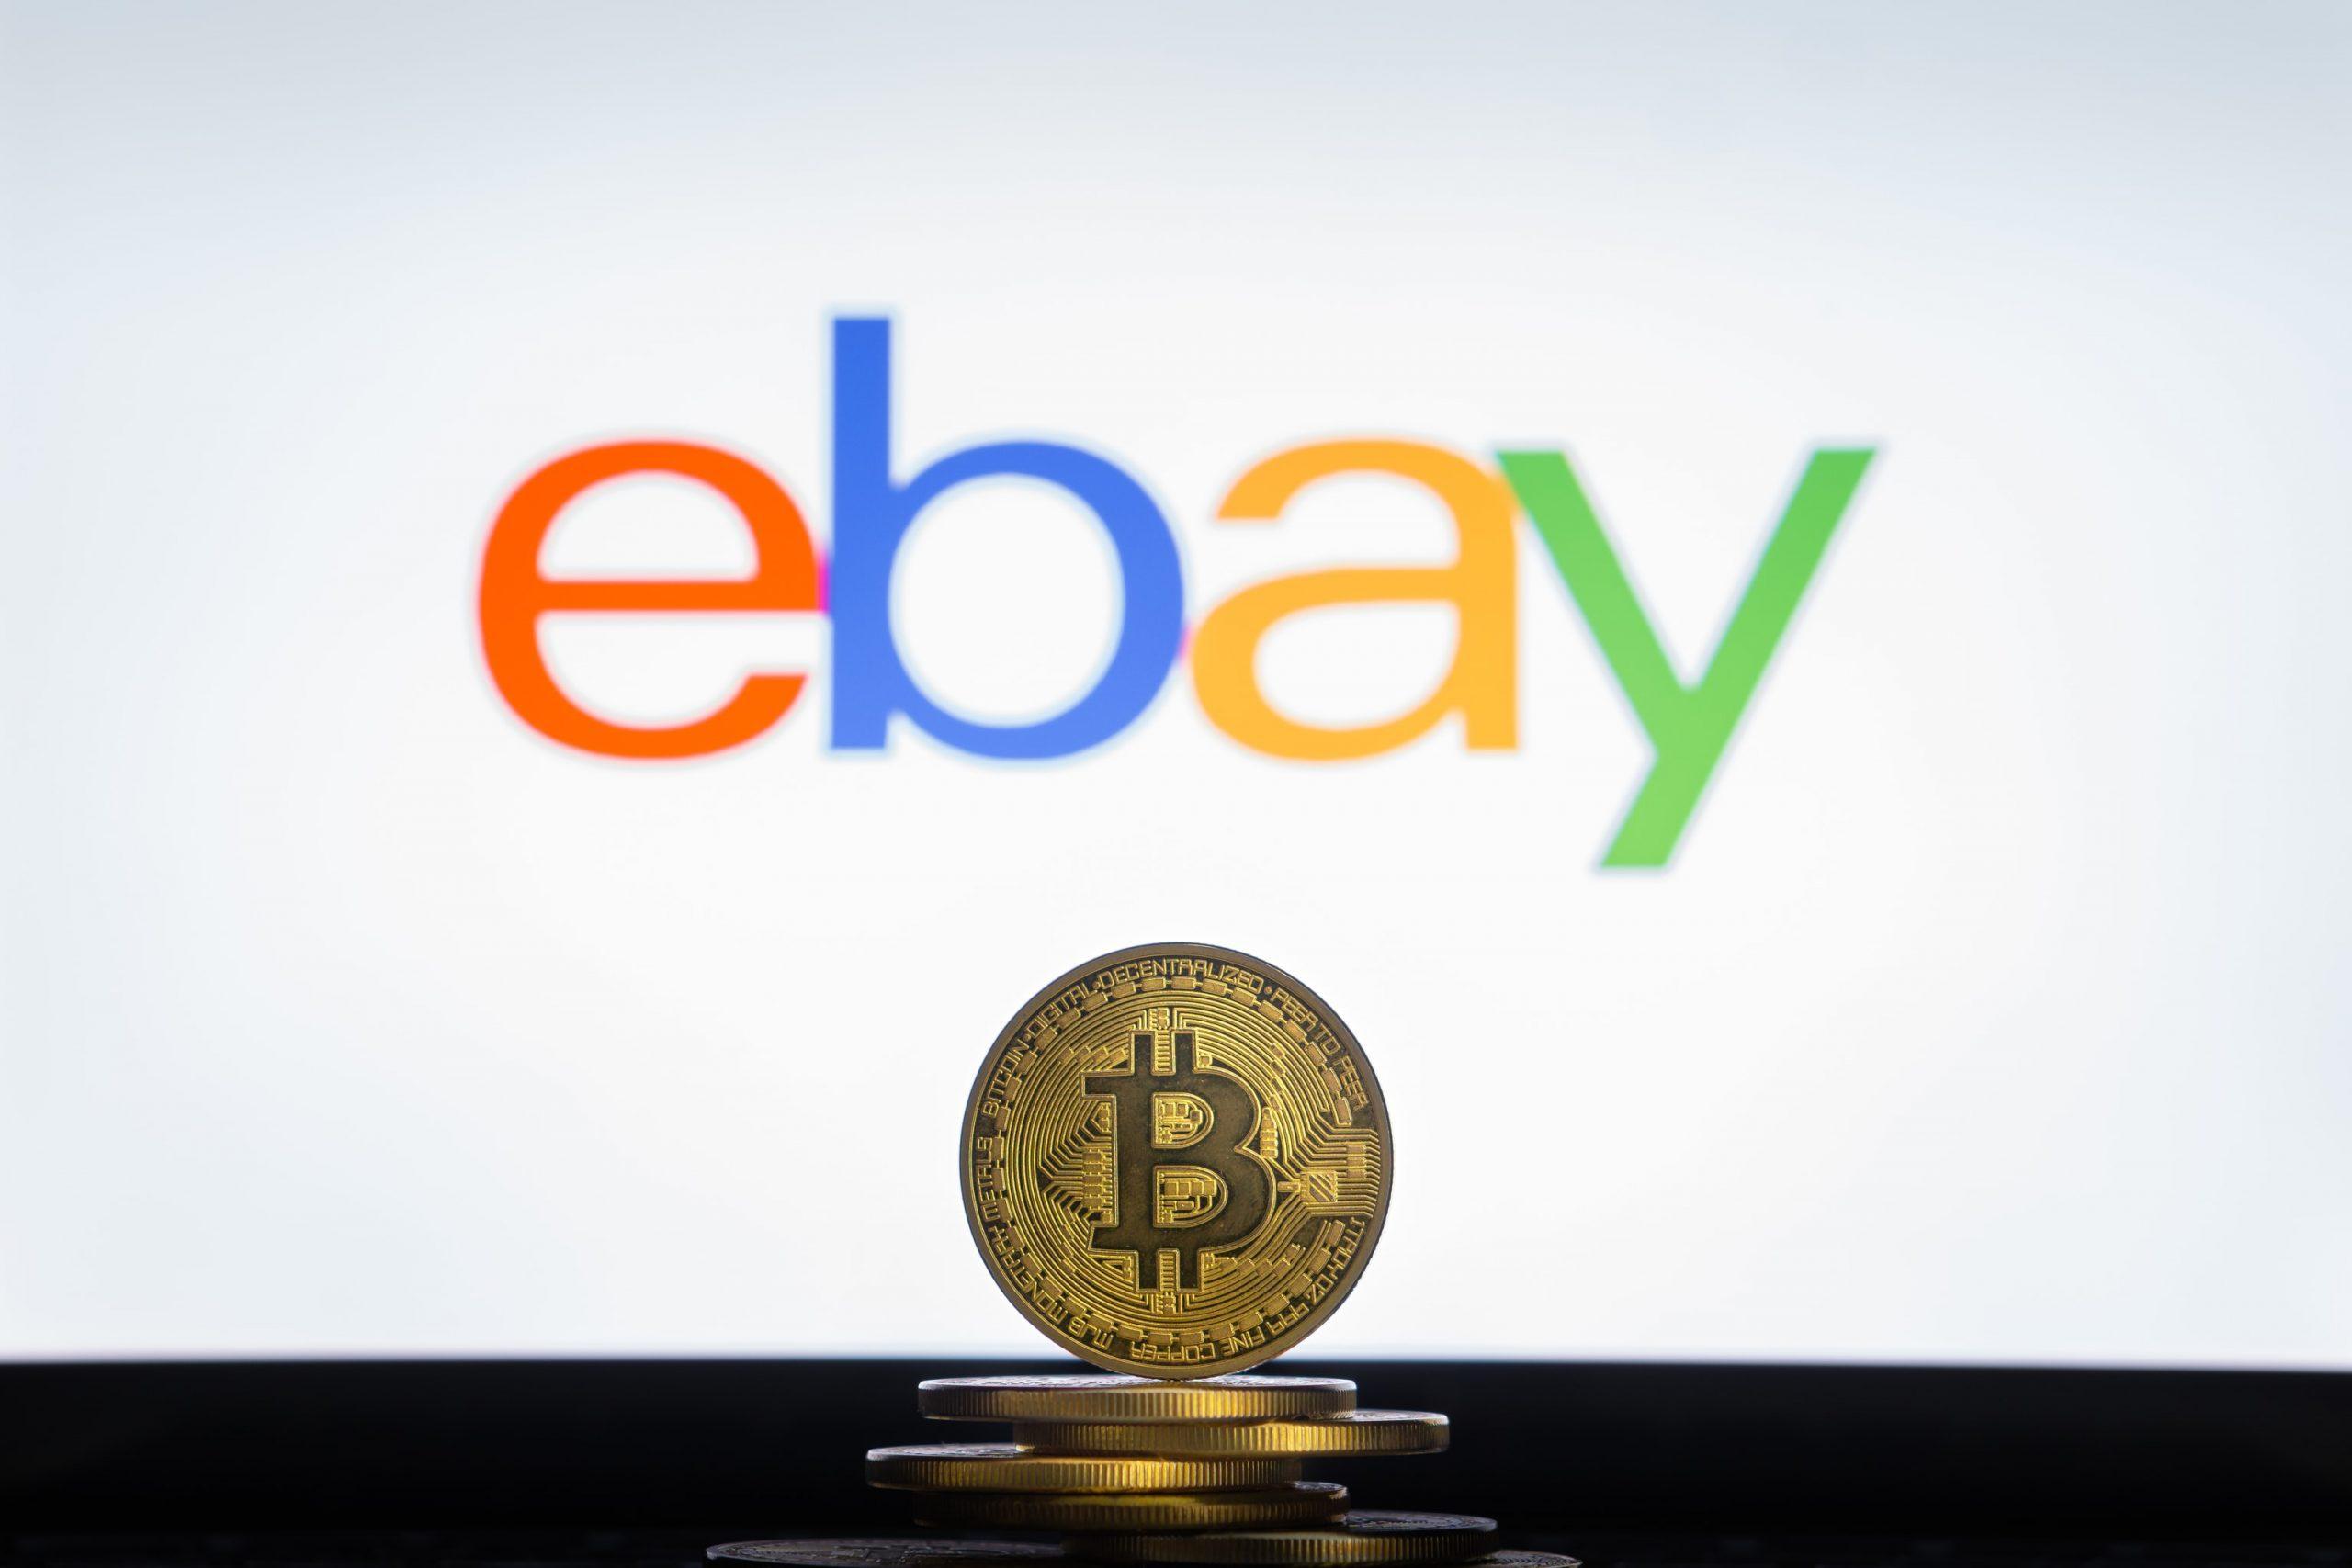 Ebay Logo mit Bitcoin Münze